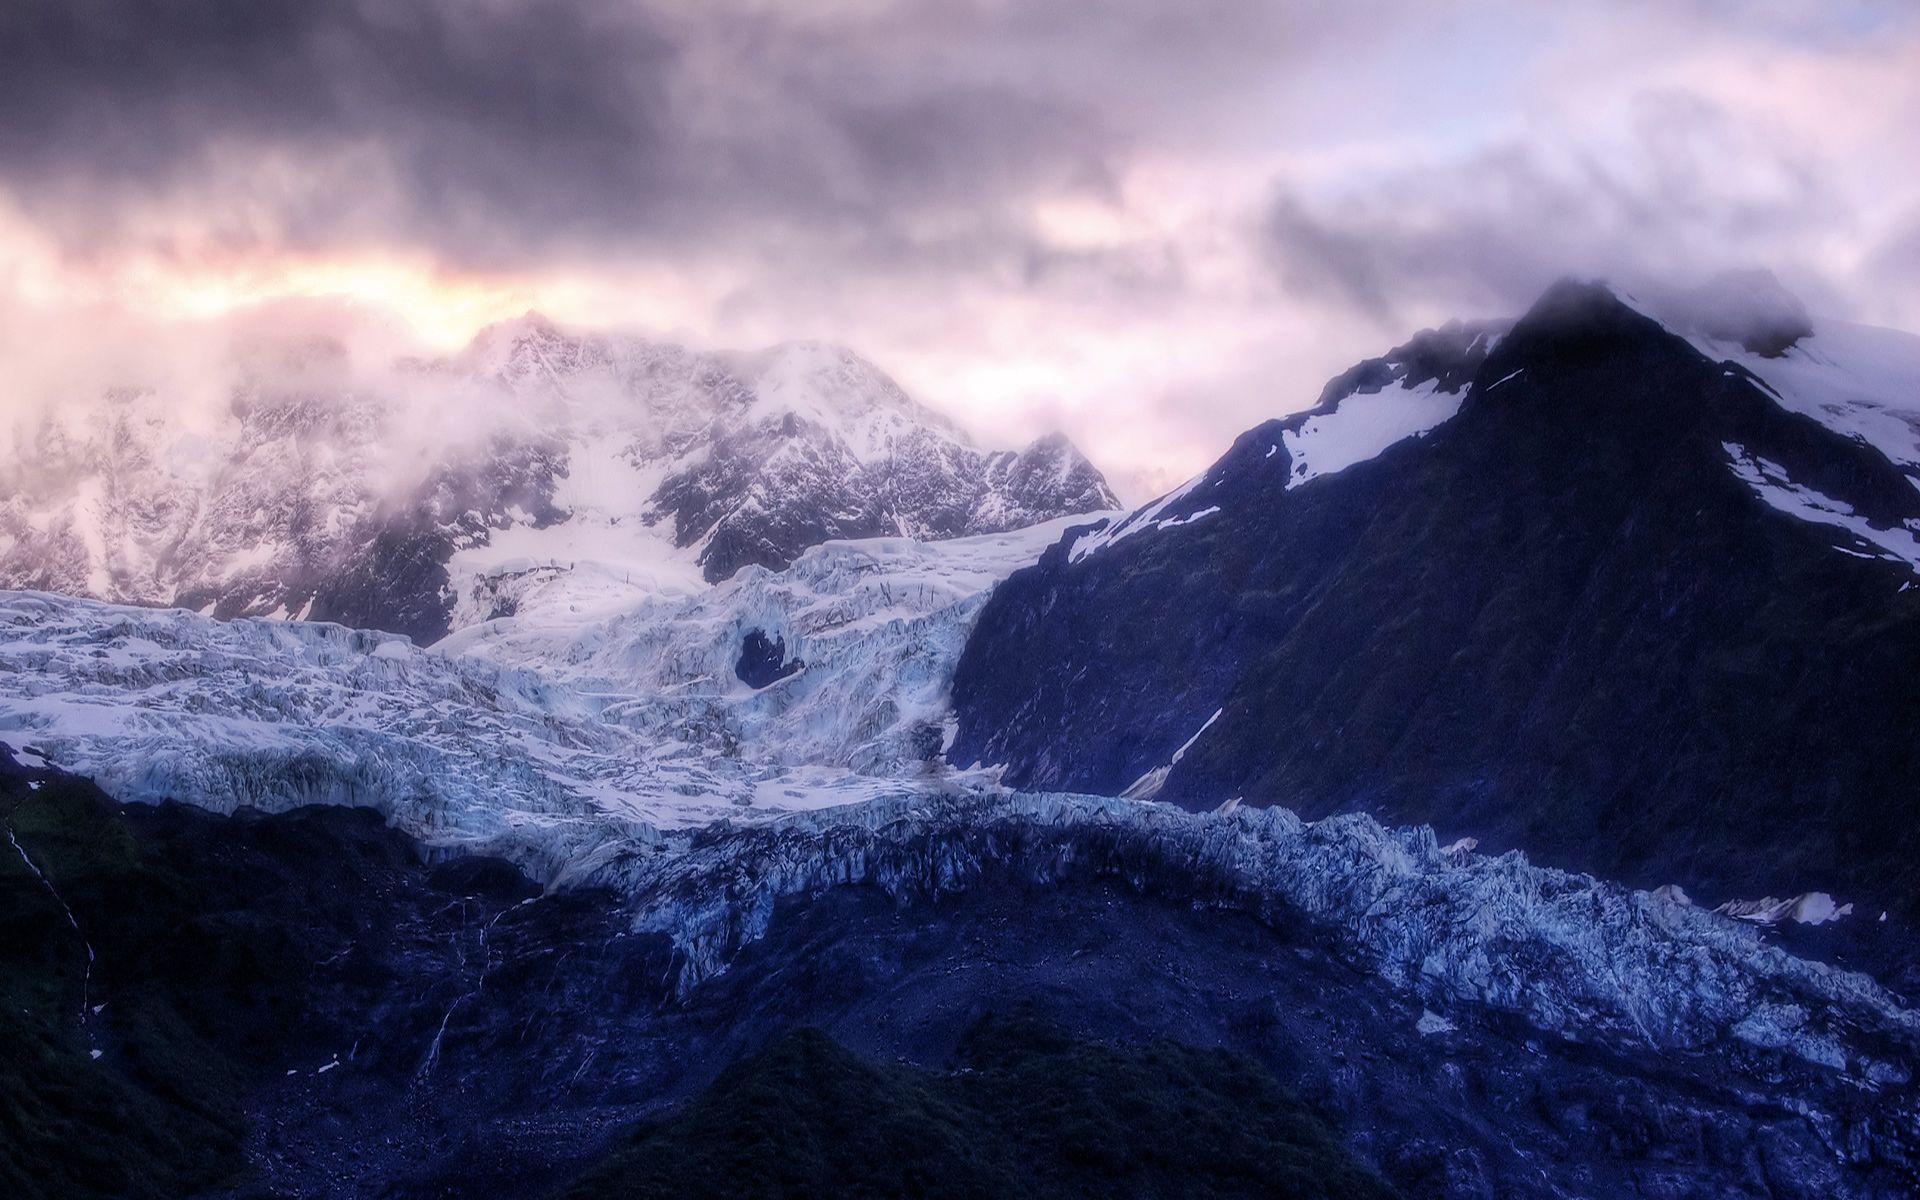 Winter mountain desktop backgrounds